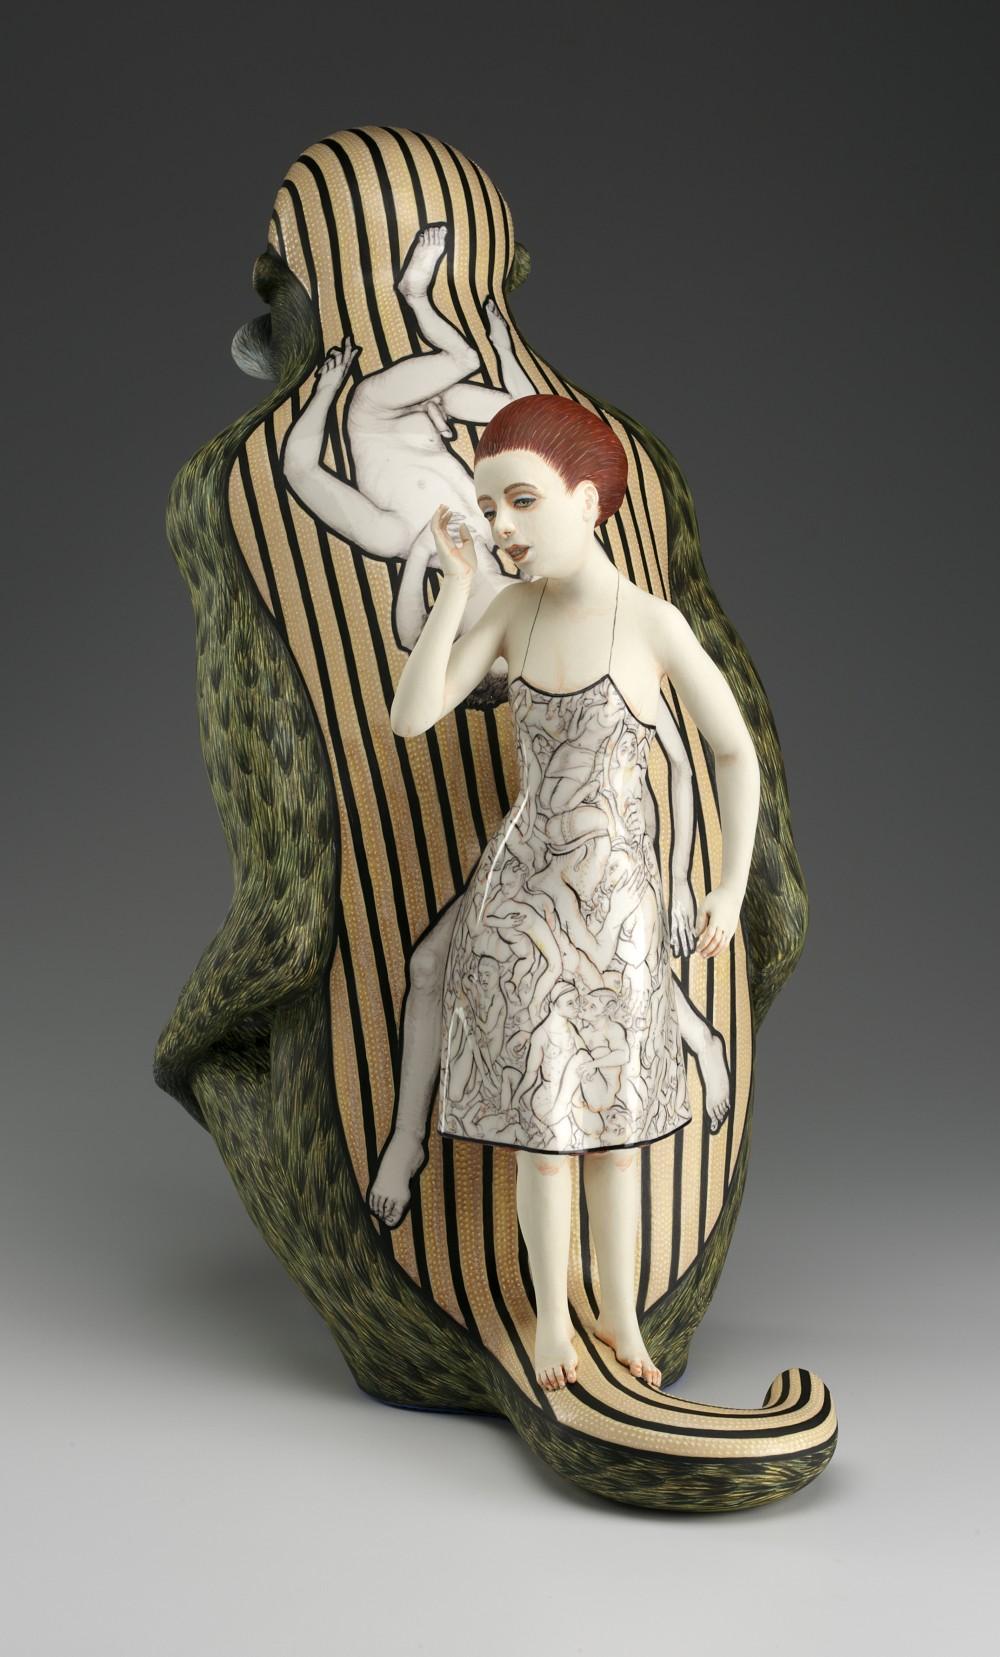 "Sergei Isupov, ""The Fear Has Big Eyes"" 2013, detail, porcelain, slip, glaze, 21 x 19 x 11""."